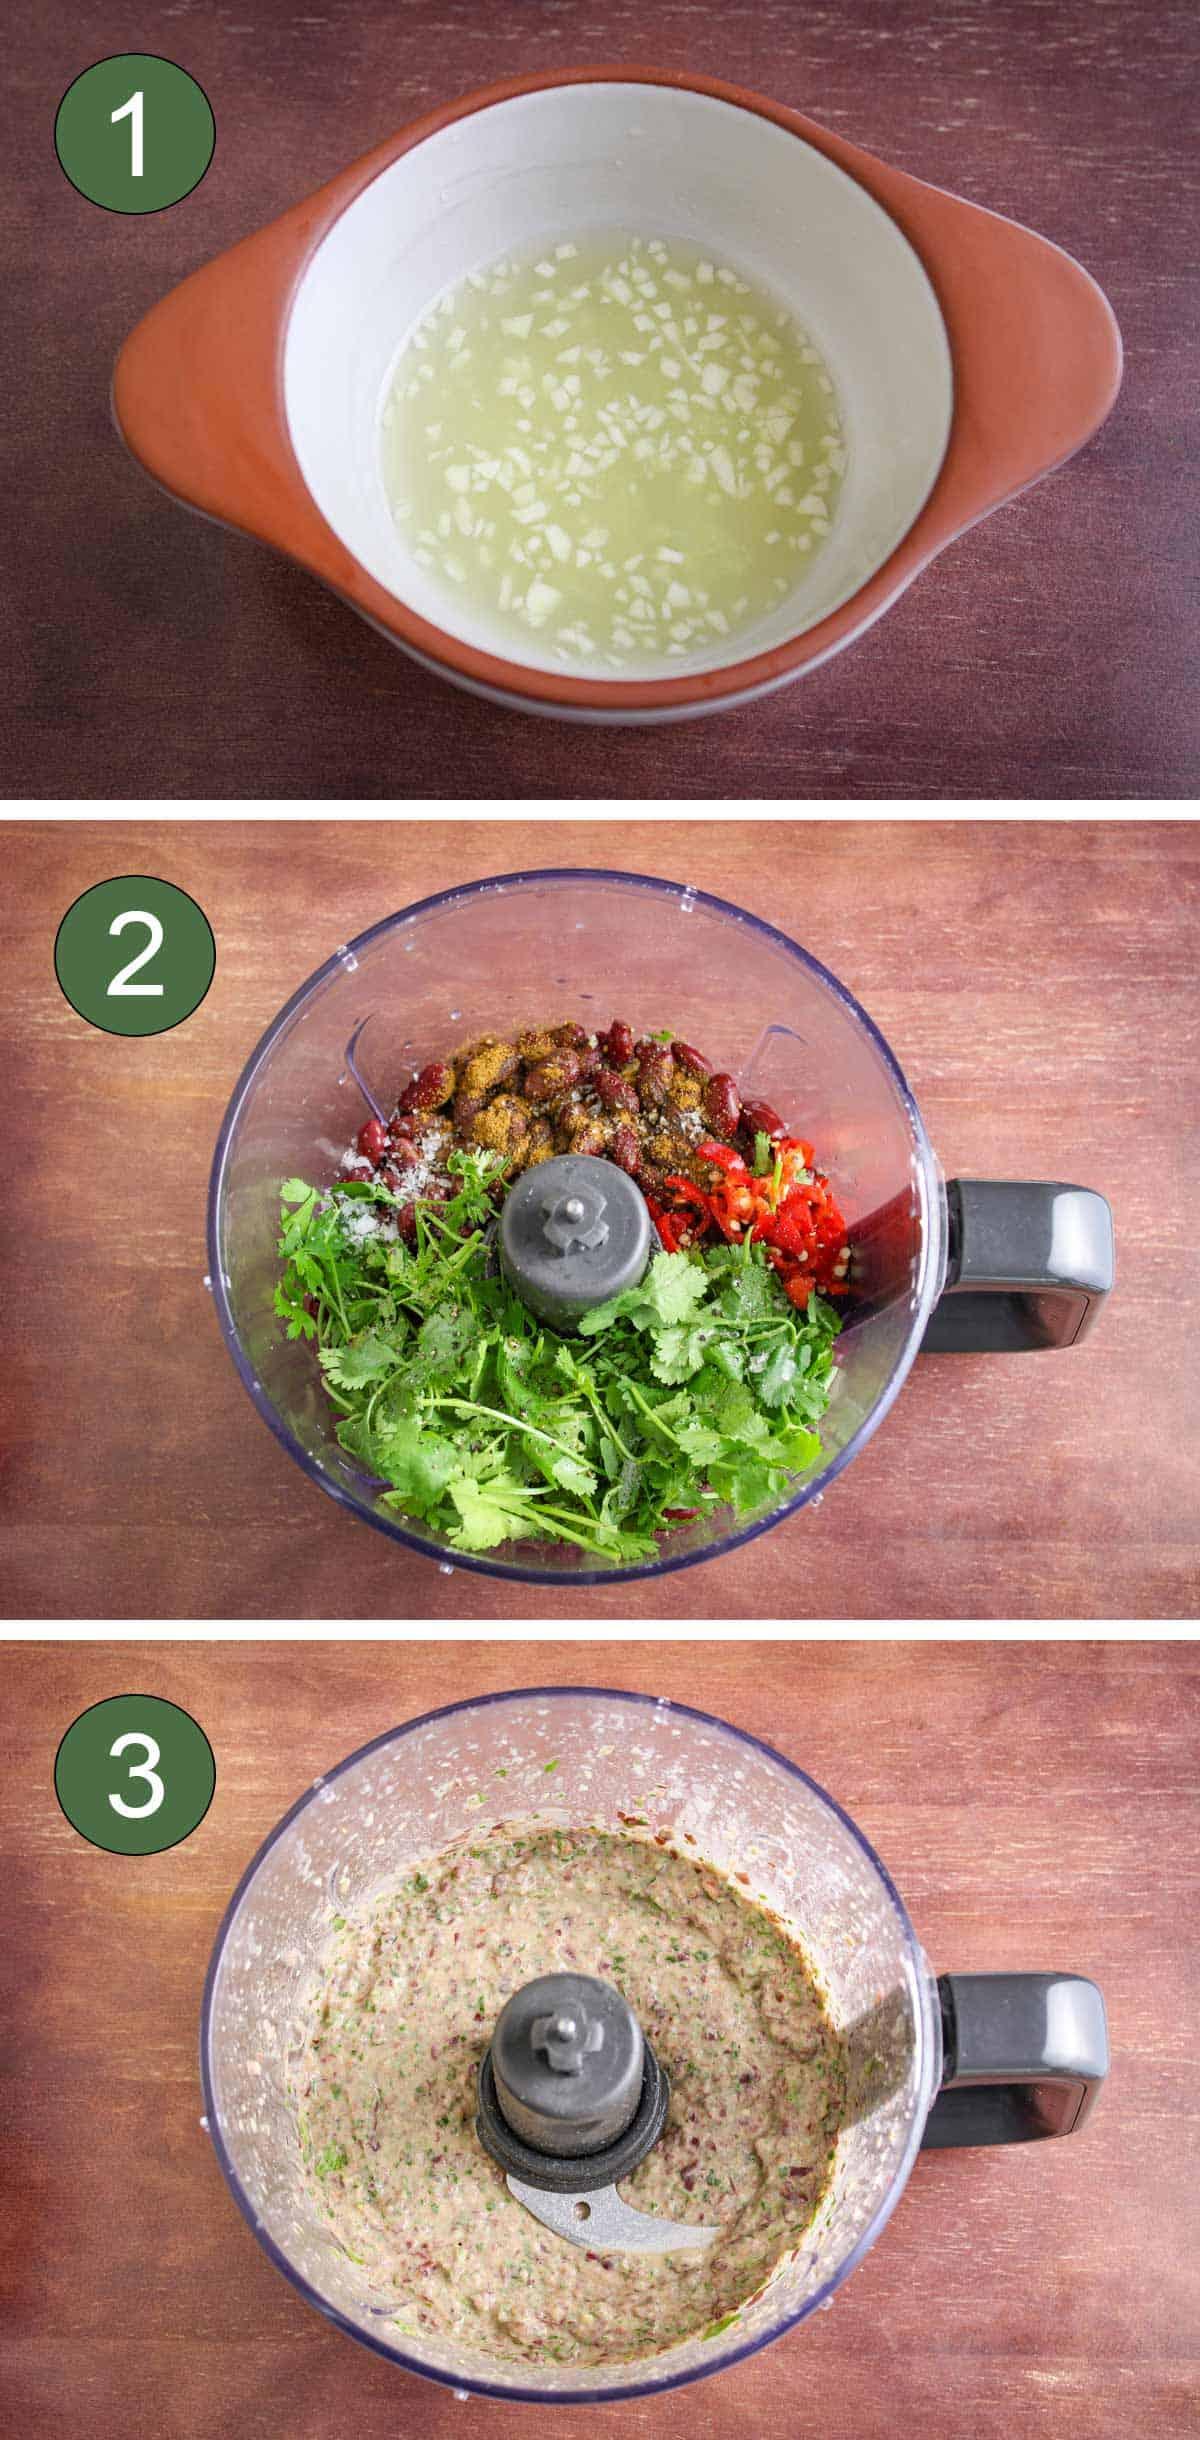 How to Make Kidney Bean Dip Process Shots